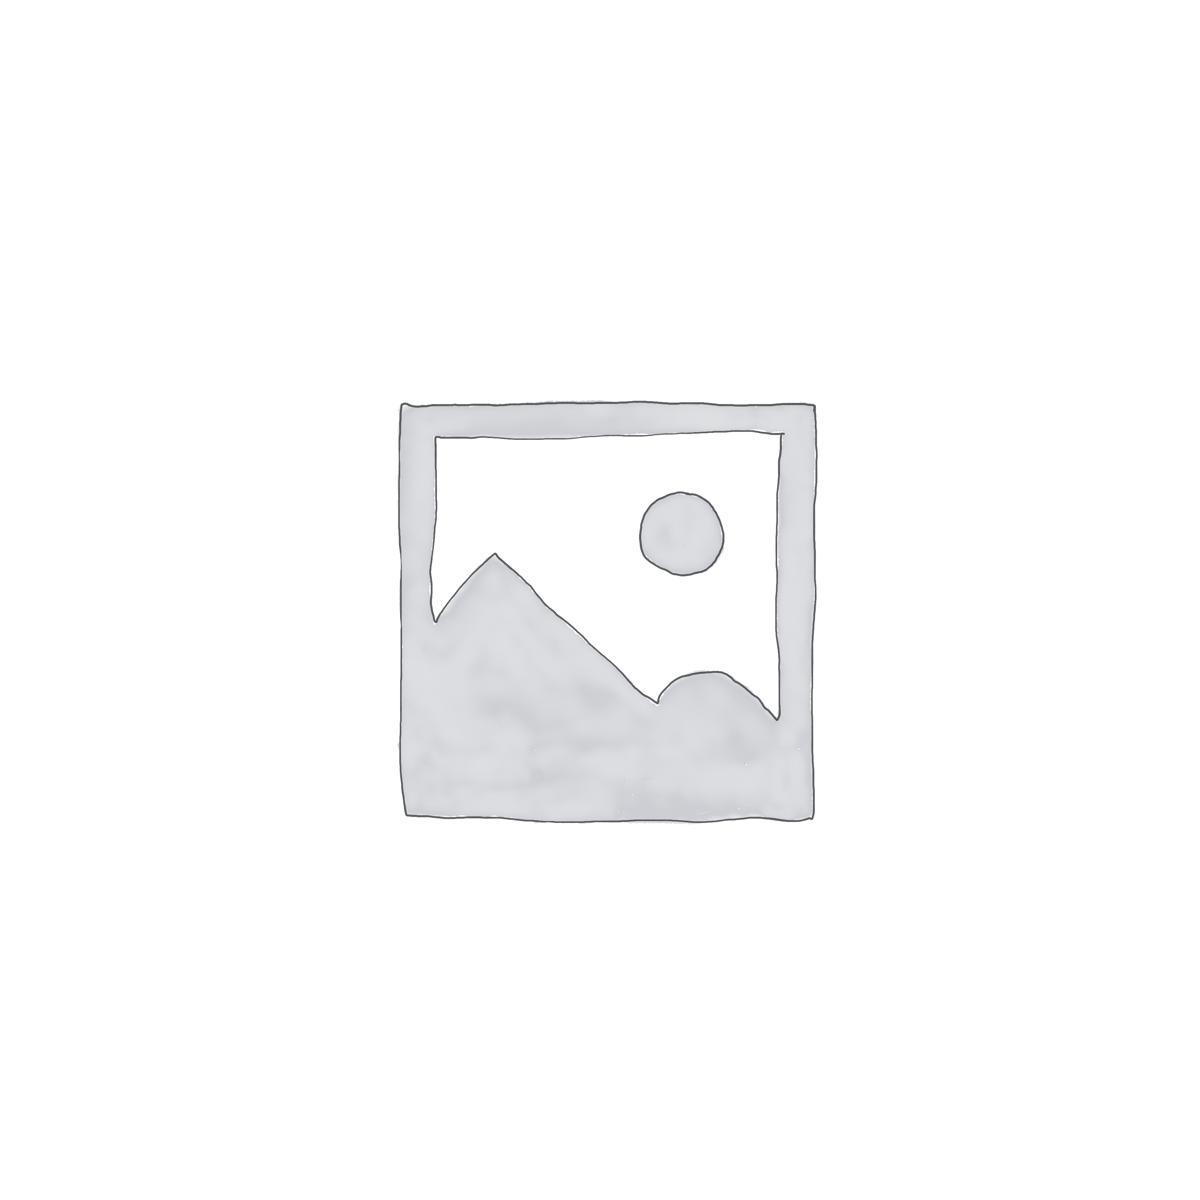 سیلوی سیمان دست دوم